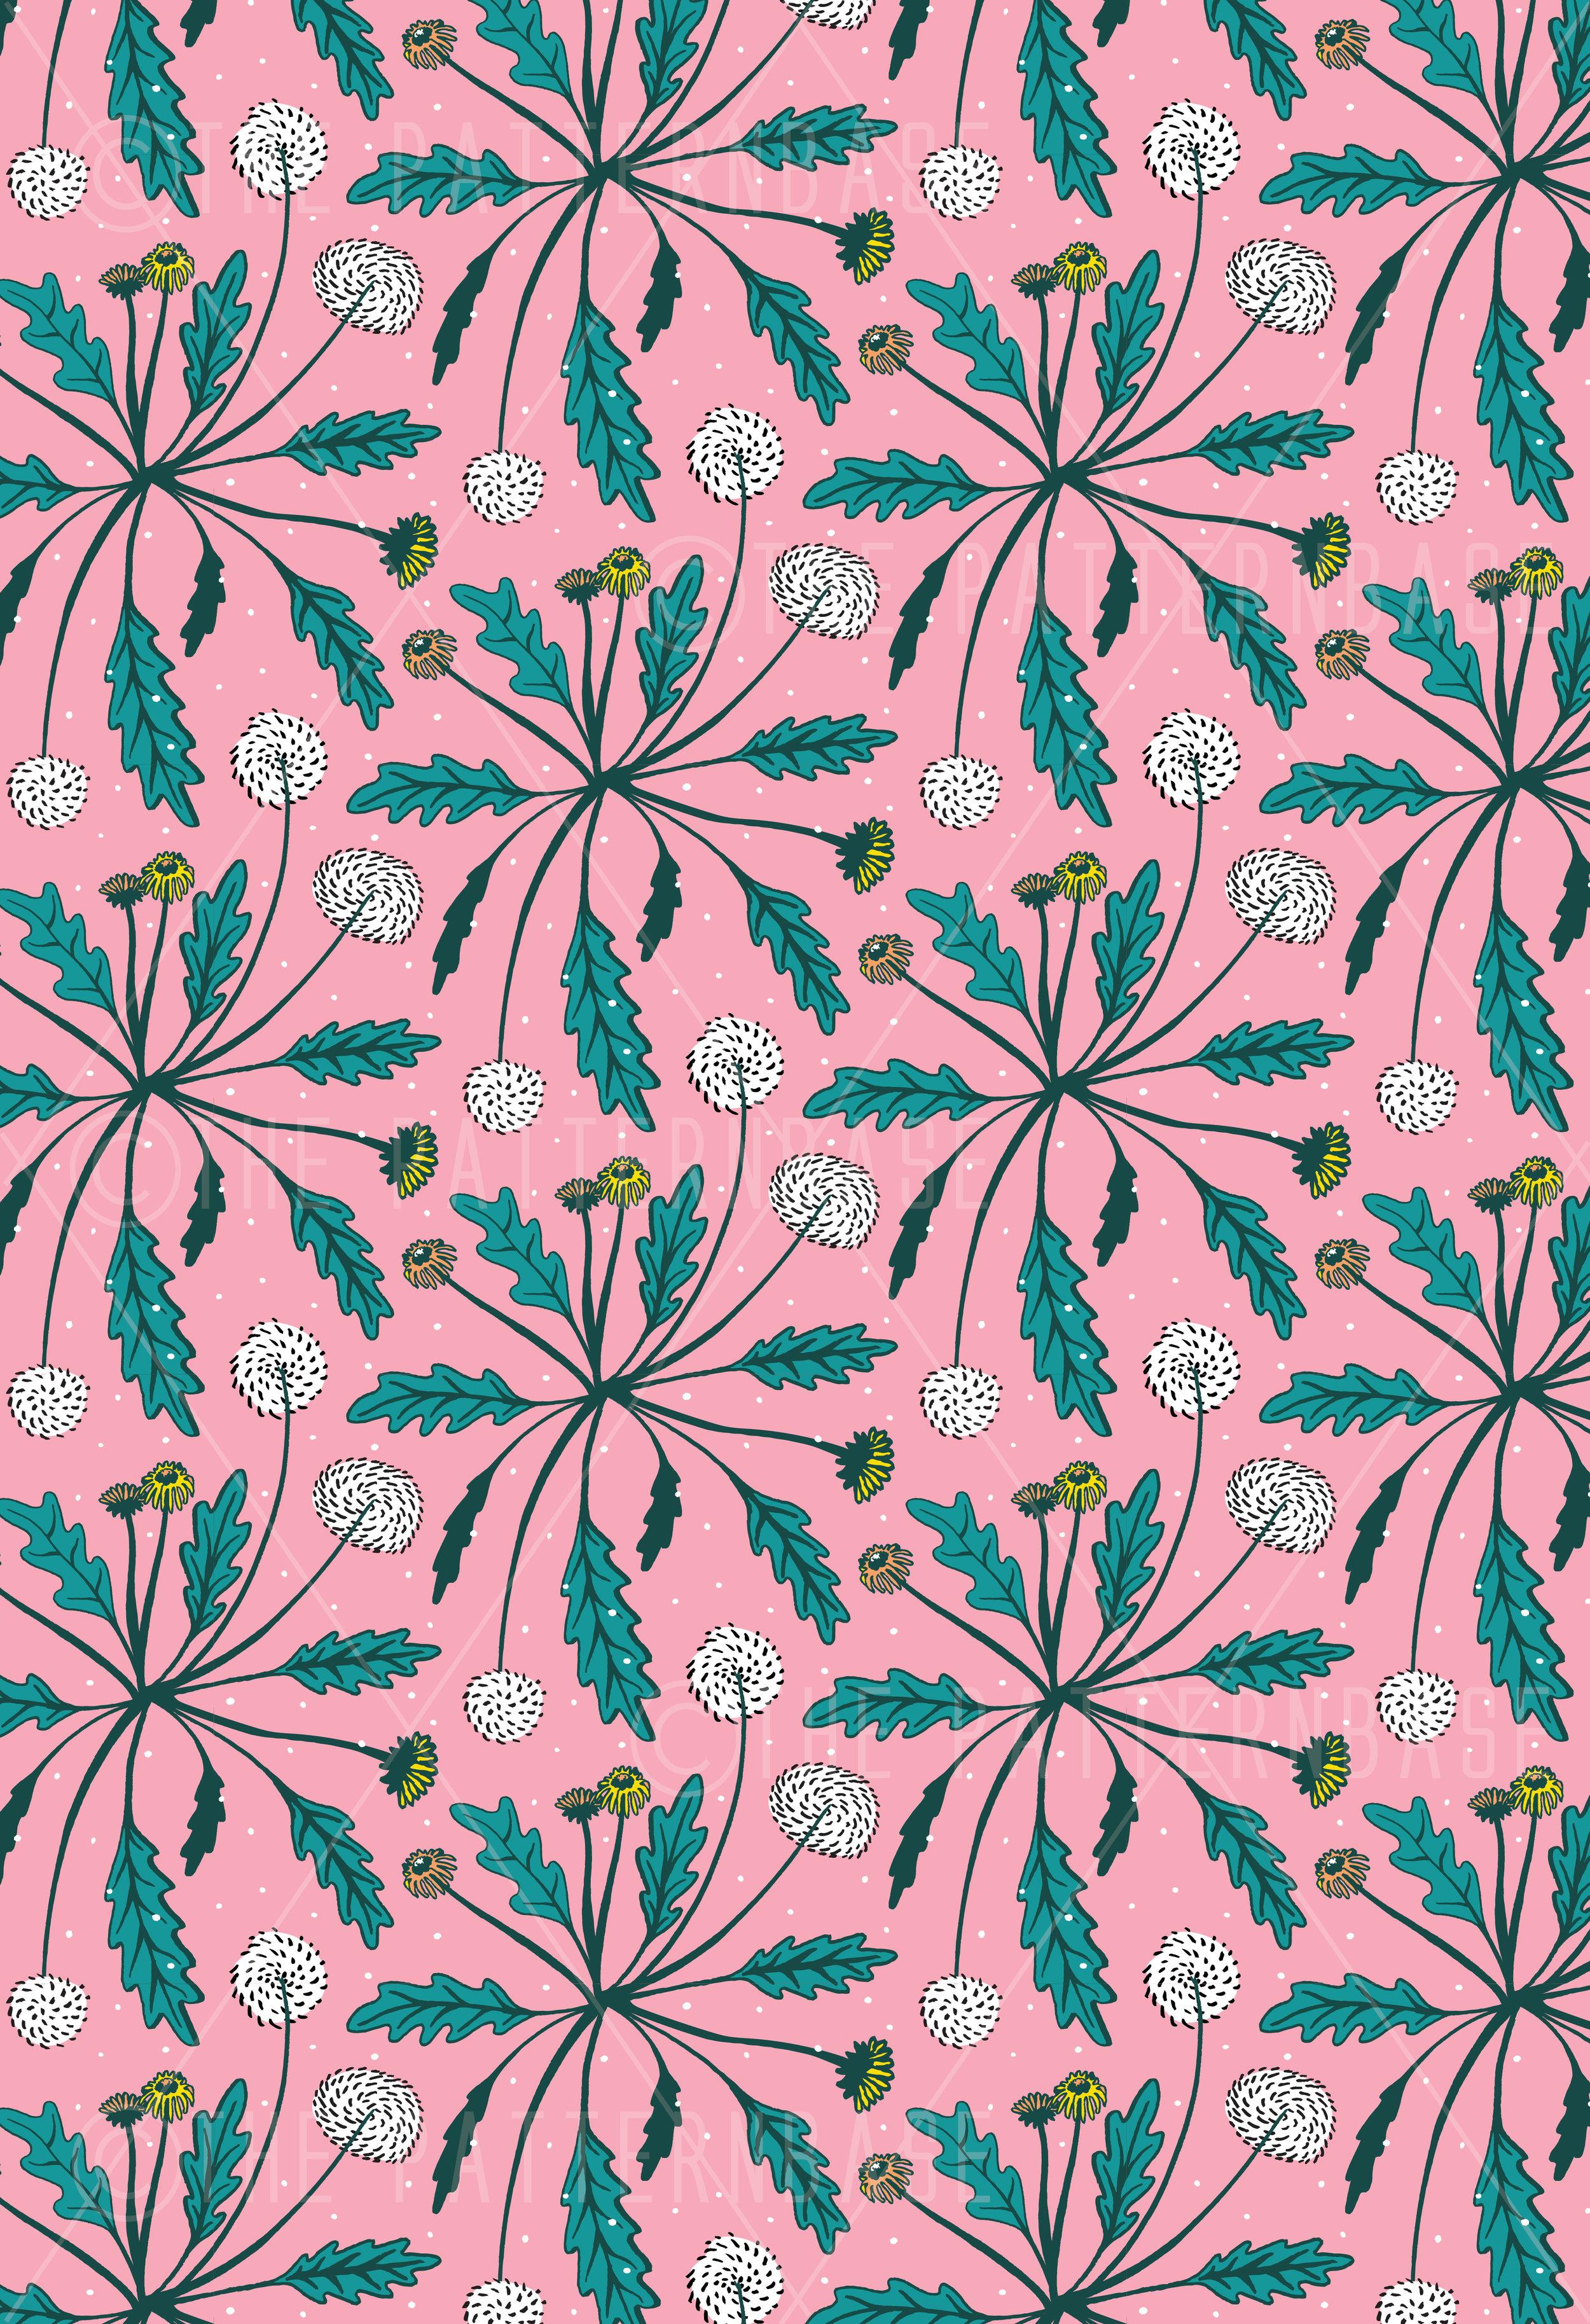 patternbase-puff-pink-wm.jpg